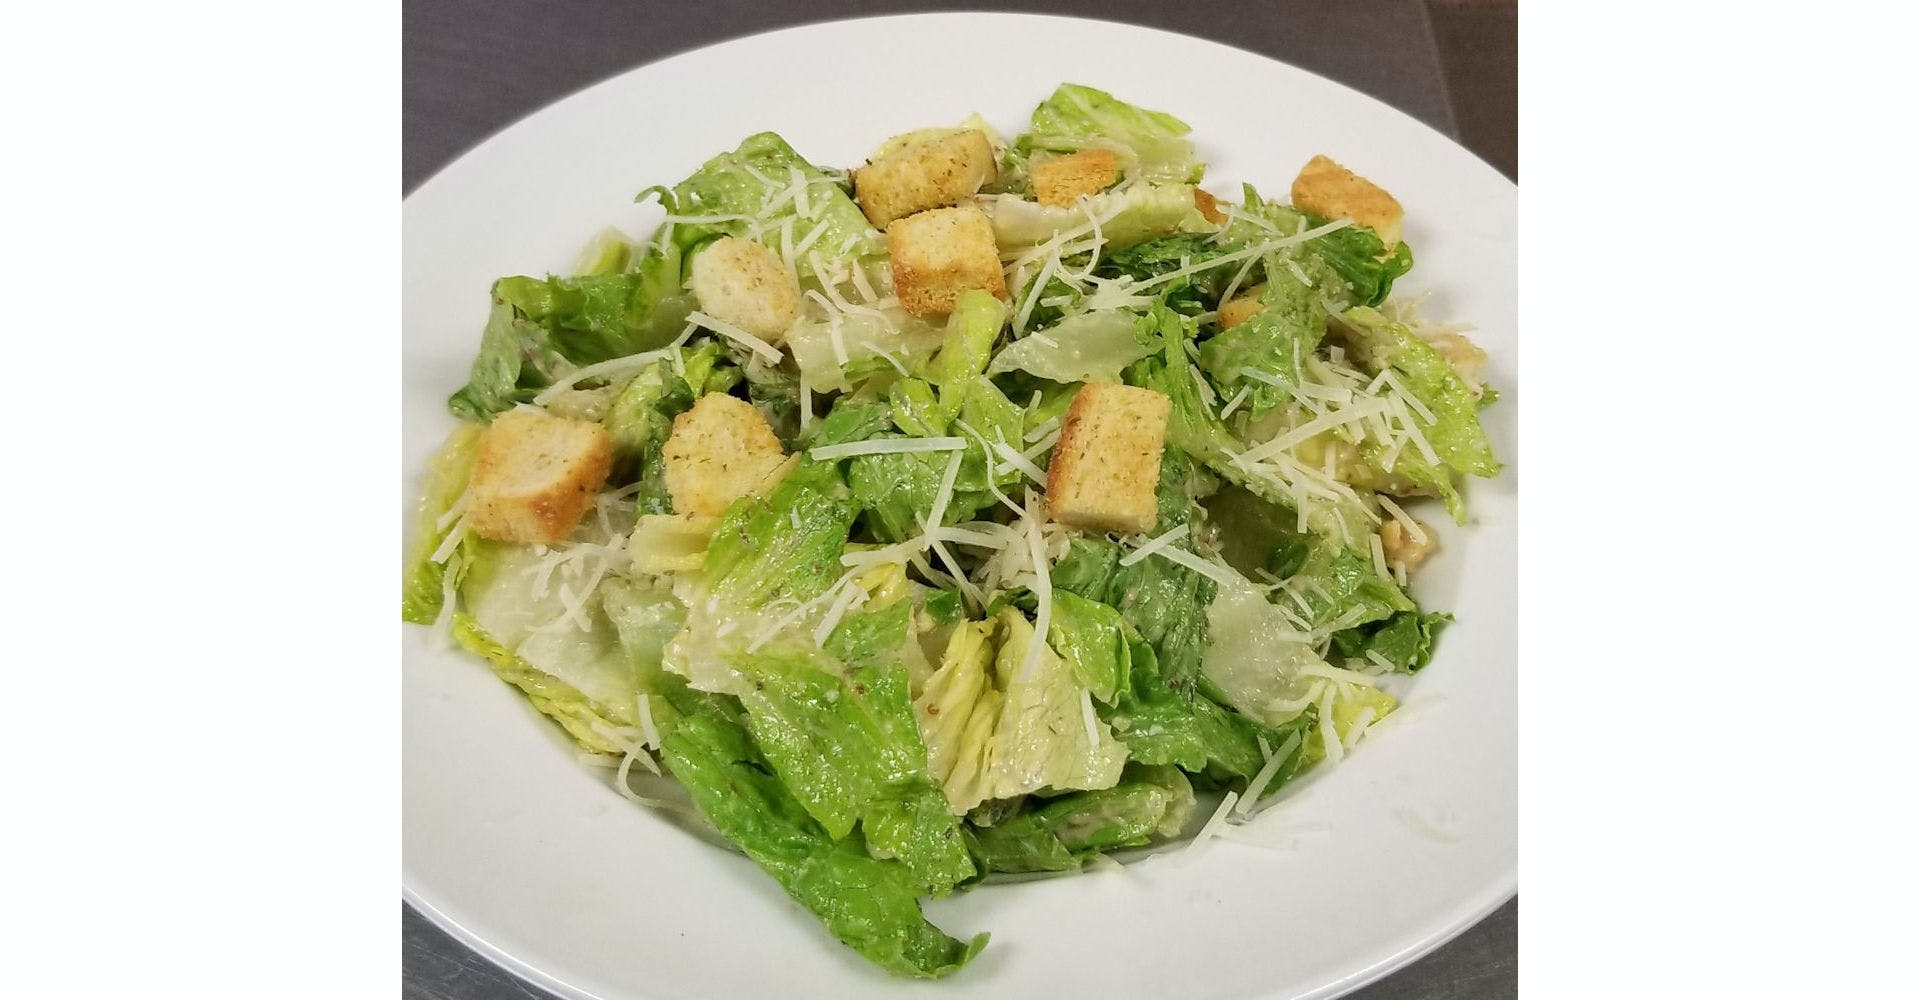 Caesar Salad from Grazies Italian Grill in Stevens Point, WI